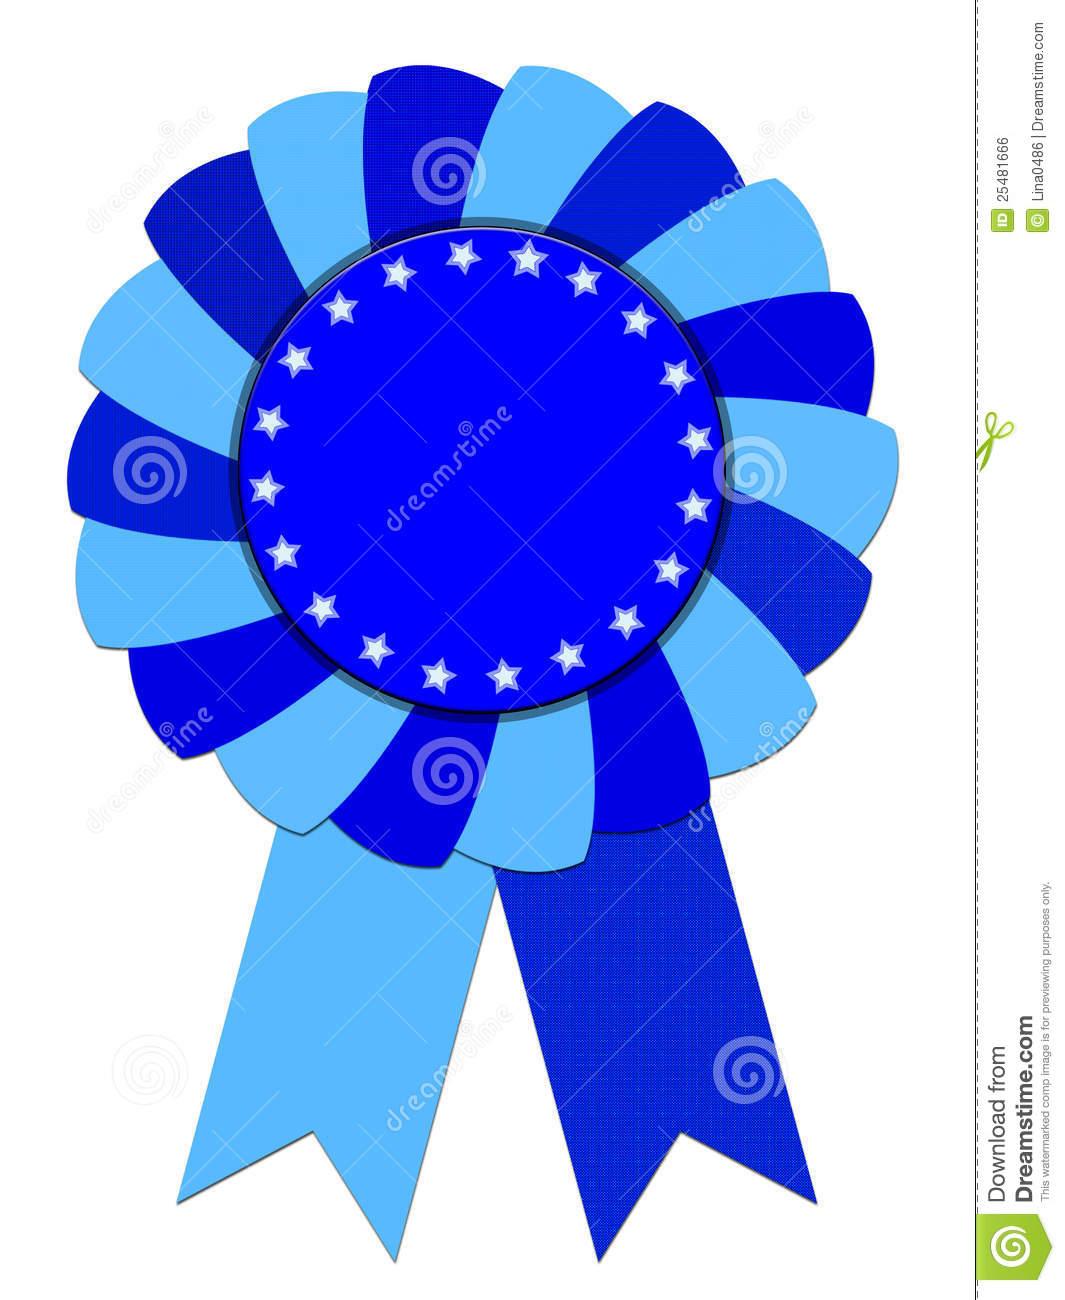 Free Clipart Blue Ribbon Award.